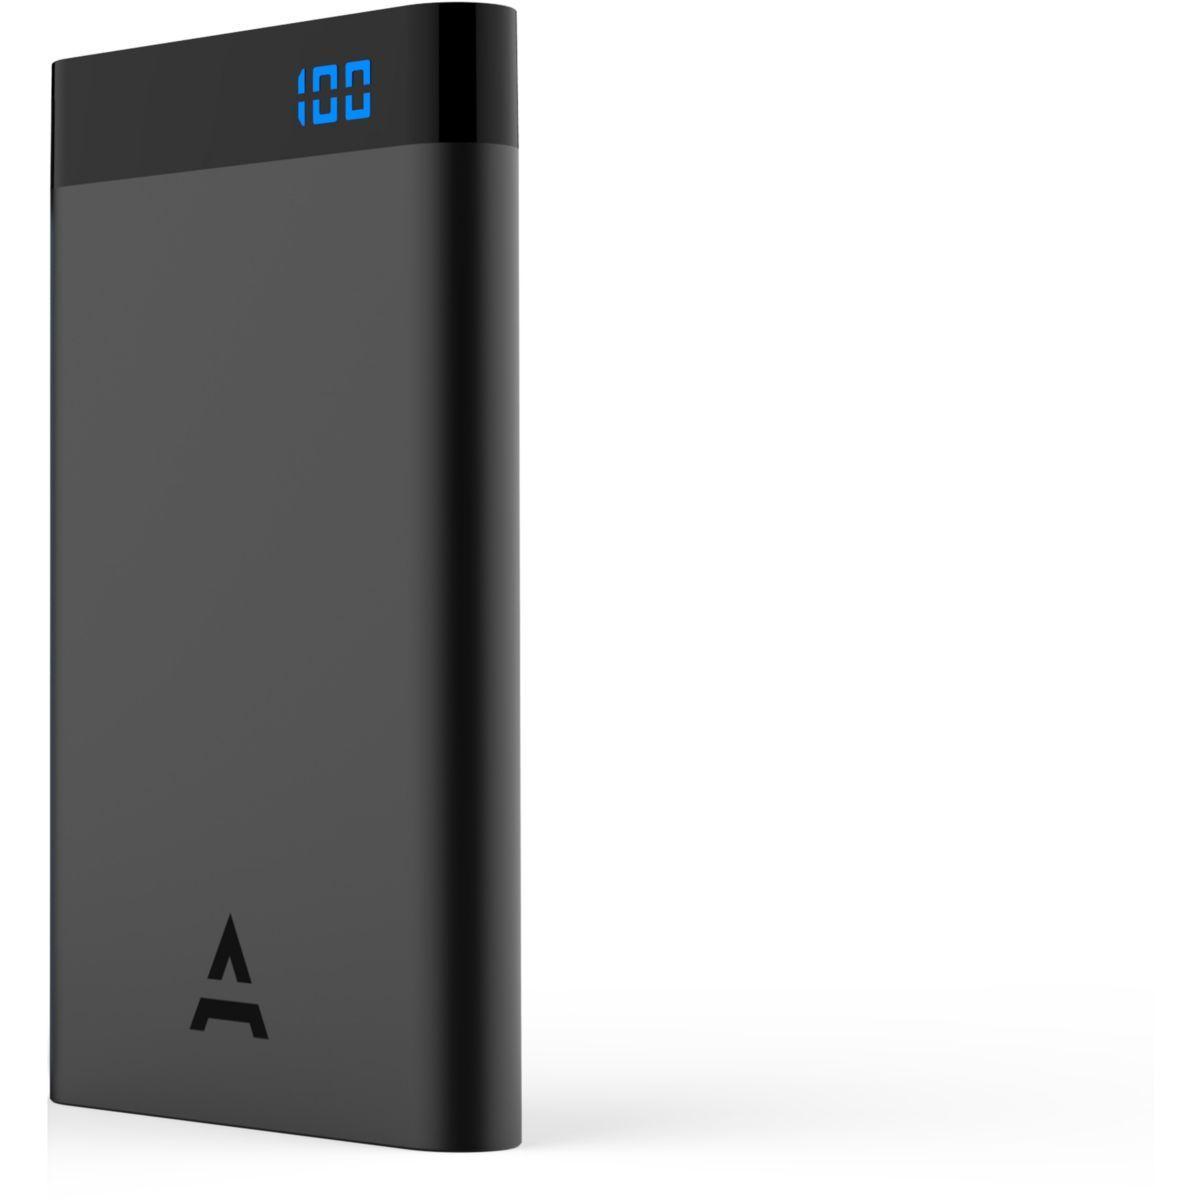 Batterie externe adeqwat 8000 mah noir - livraison offerte : code liv (photo)